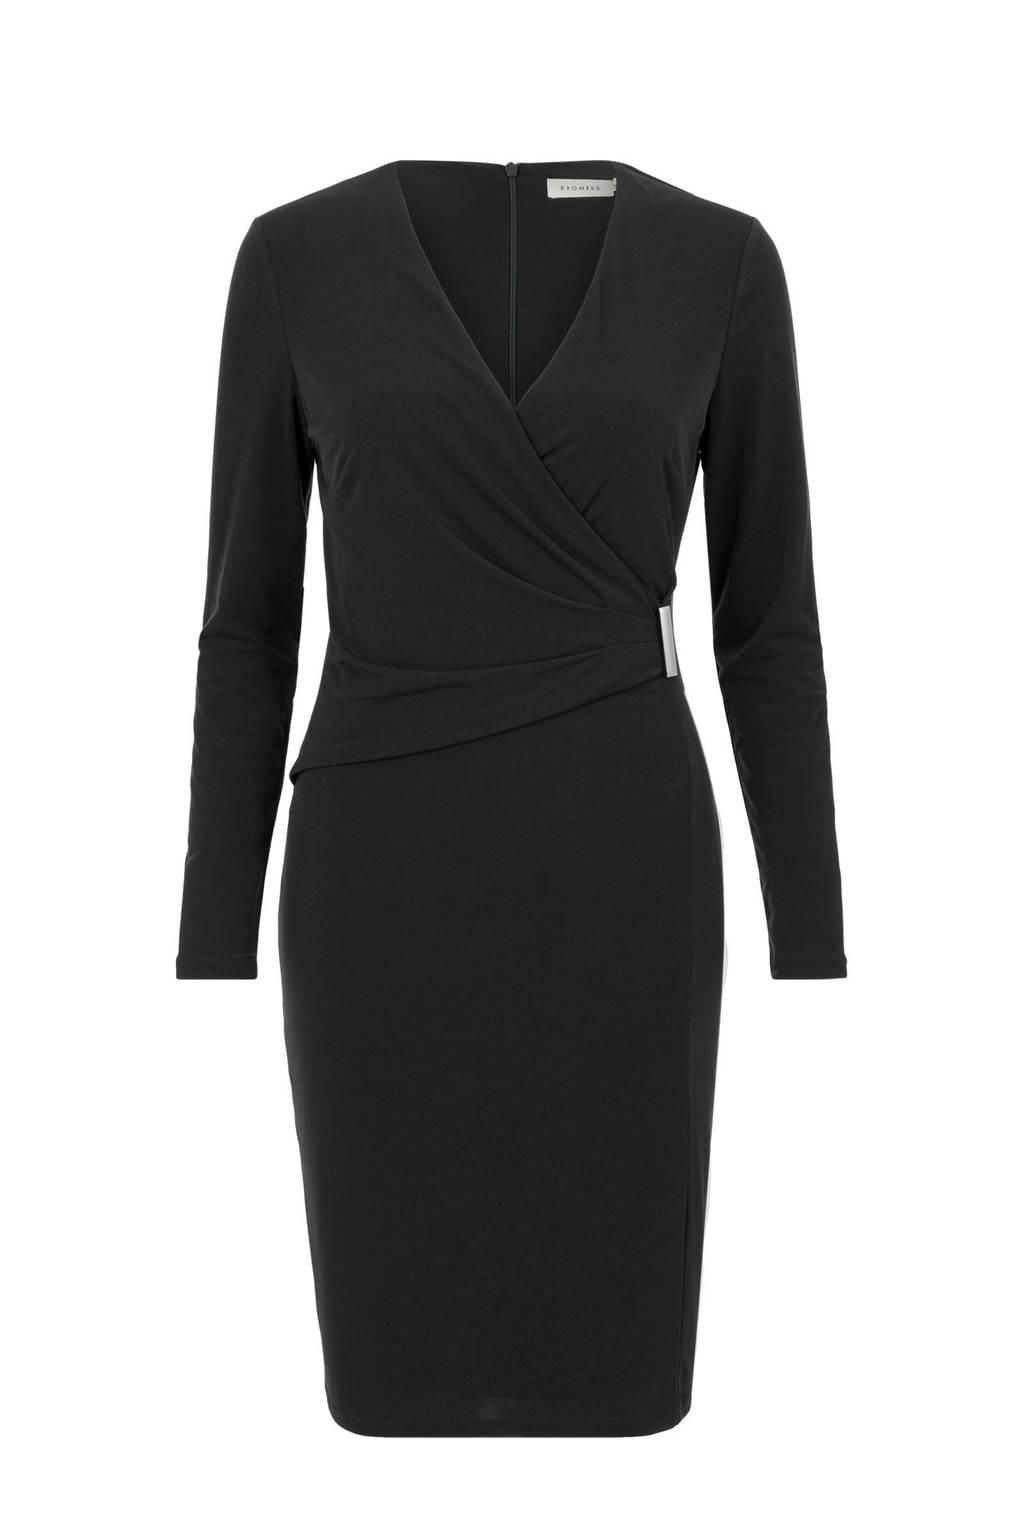 PROMISS jersey jurk met plooien zwart, Zwart